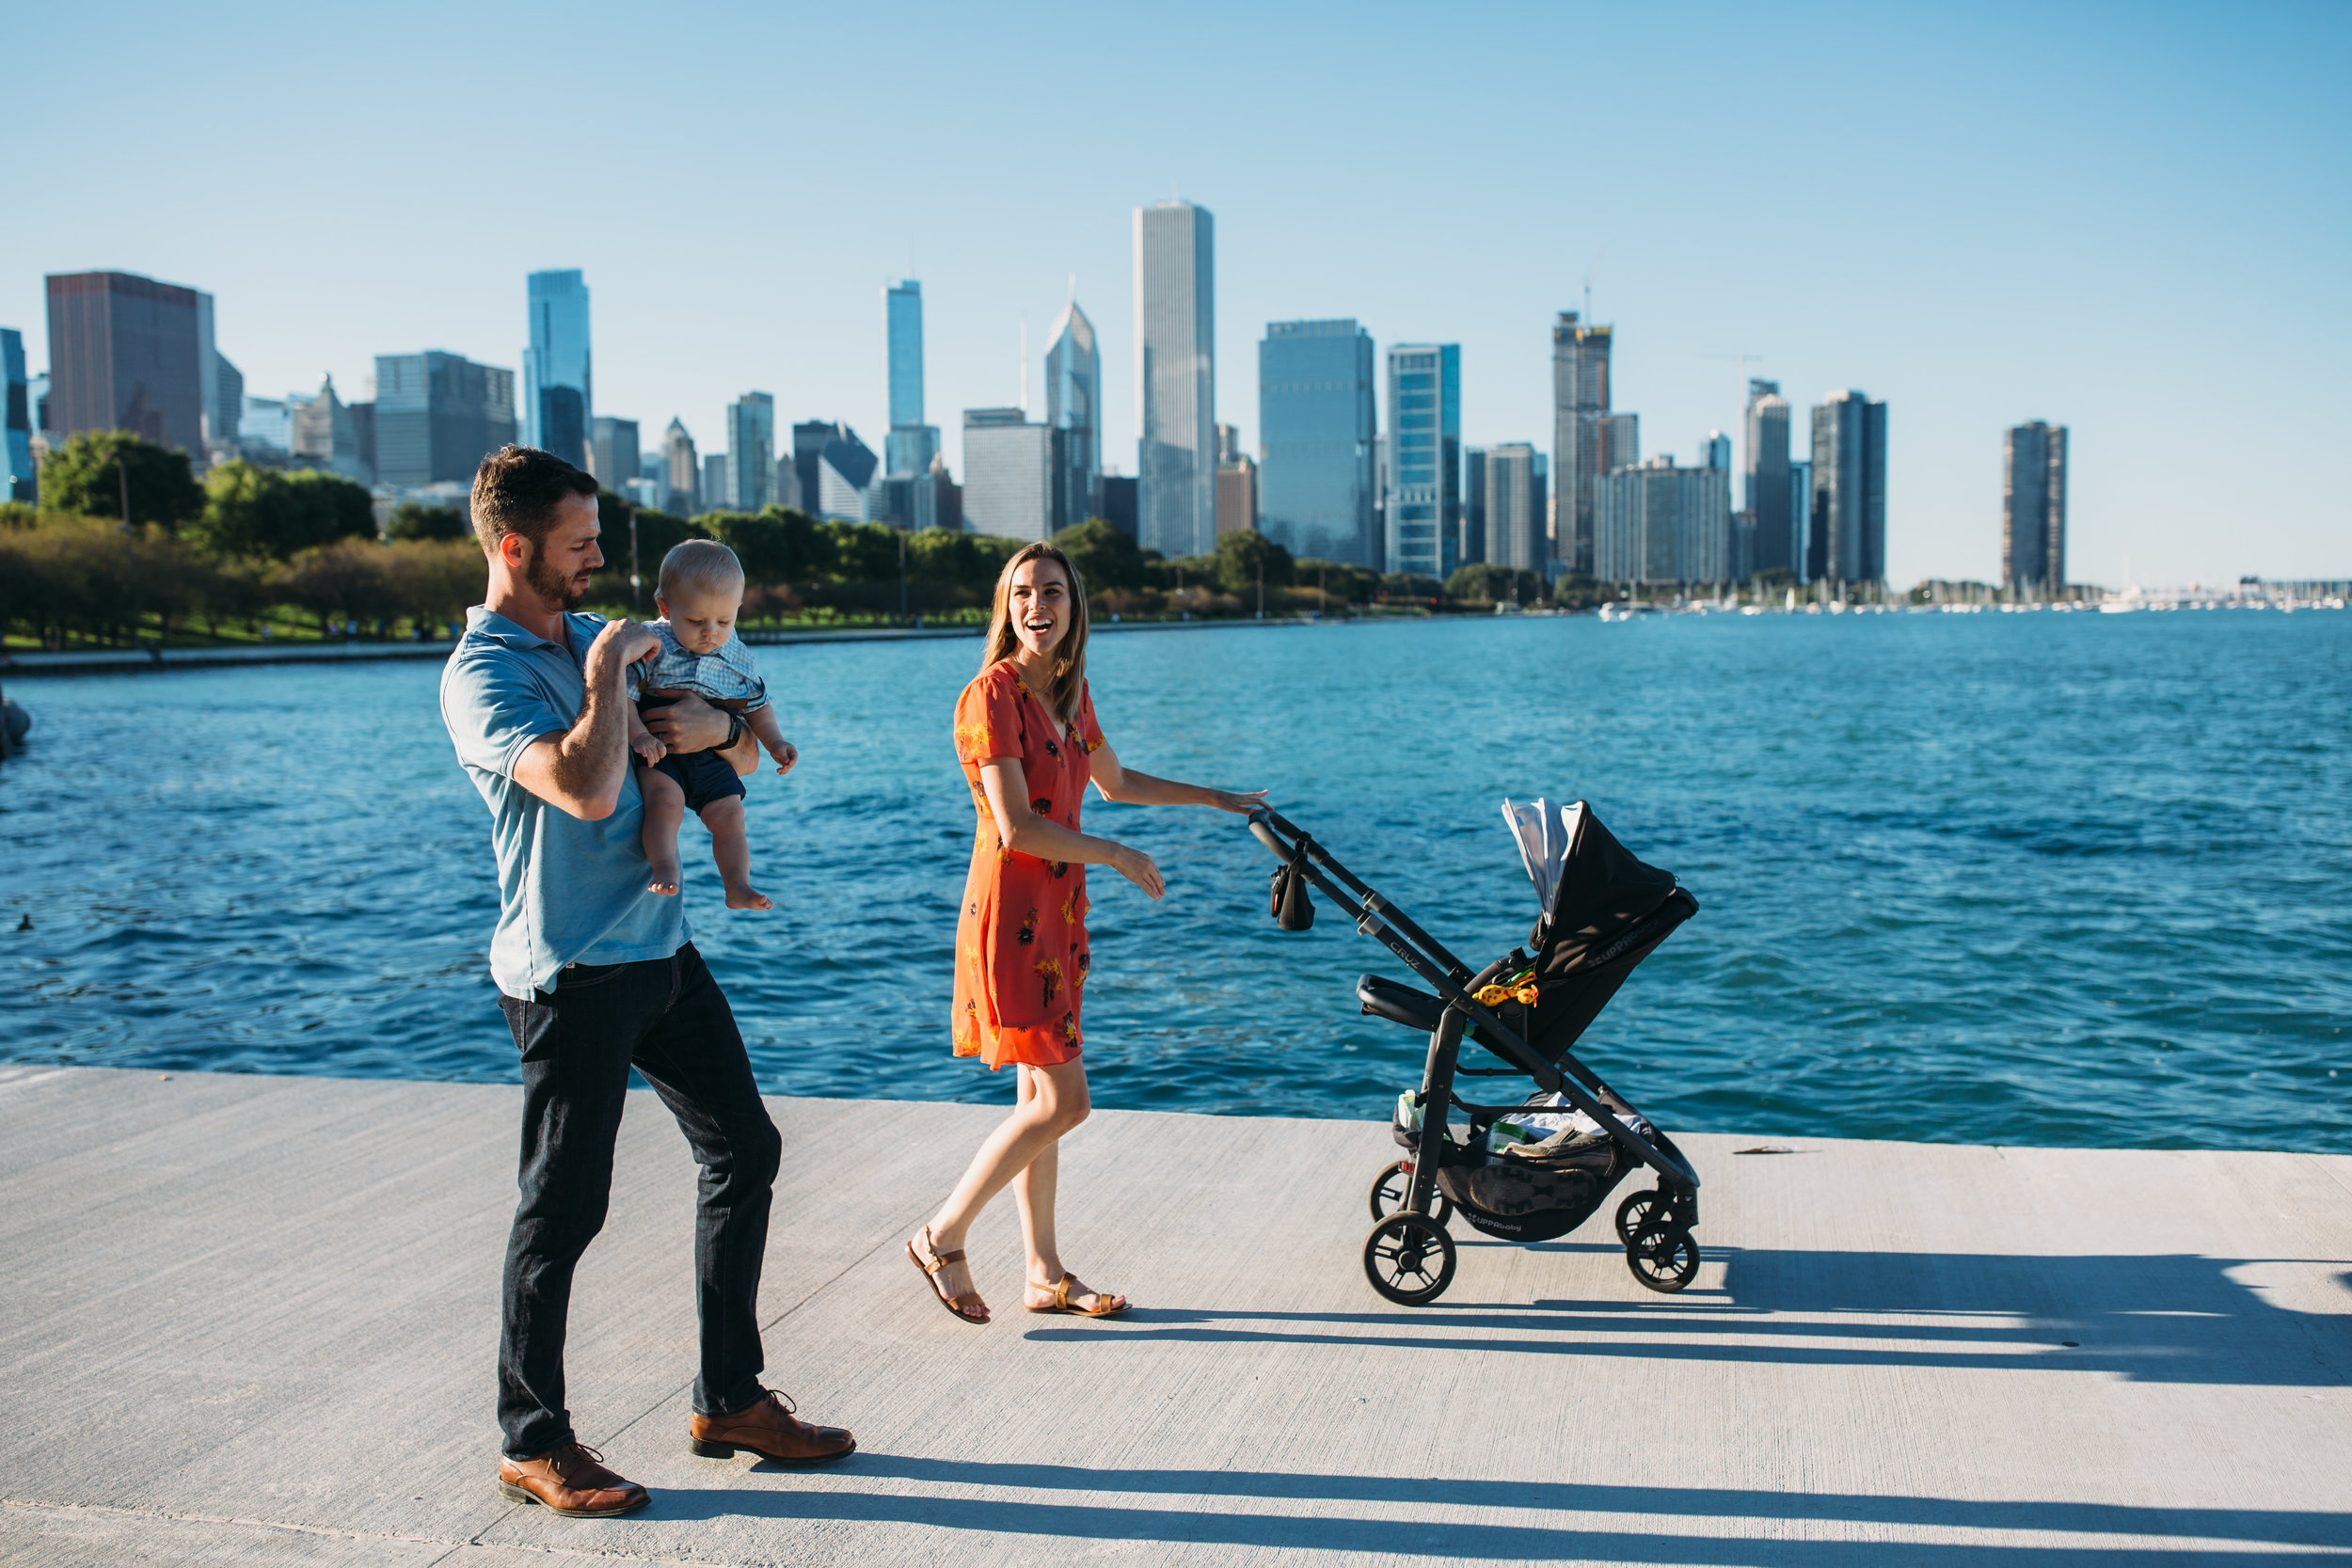 rban family photos, chicago family photos, family photography st. louis, family portraits denver